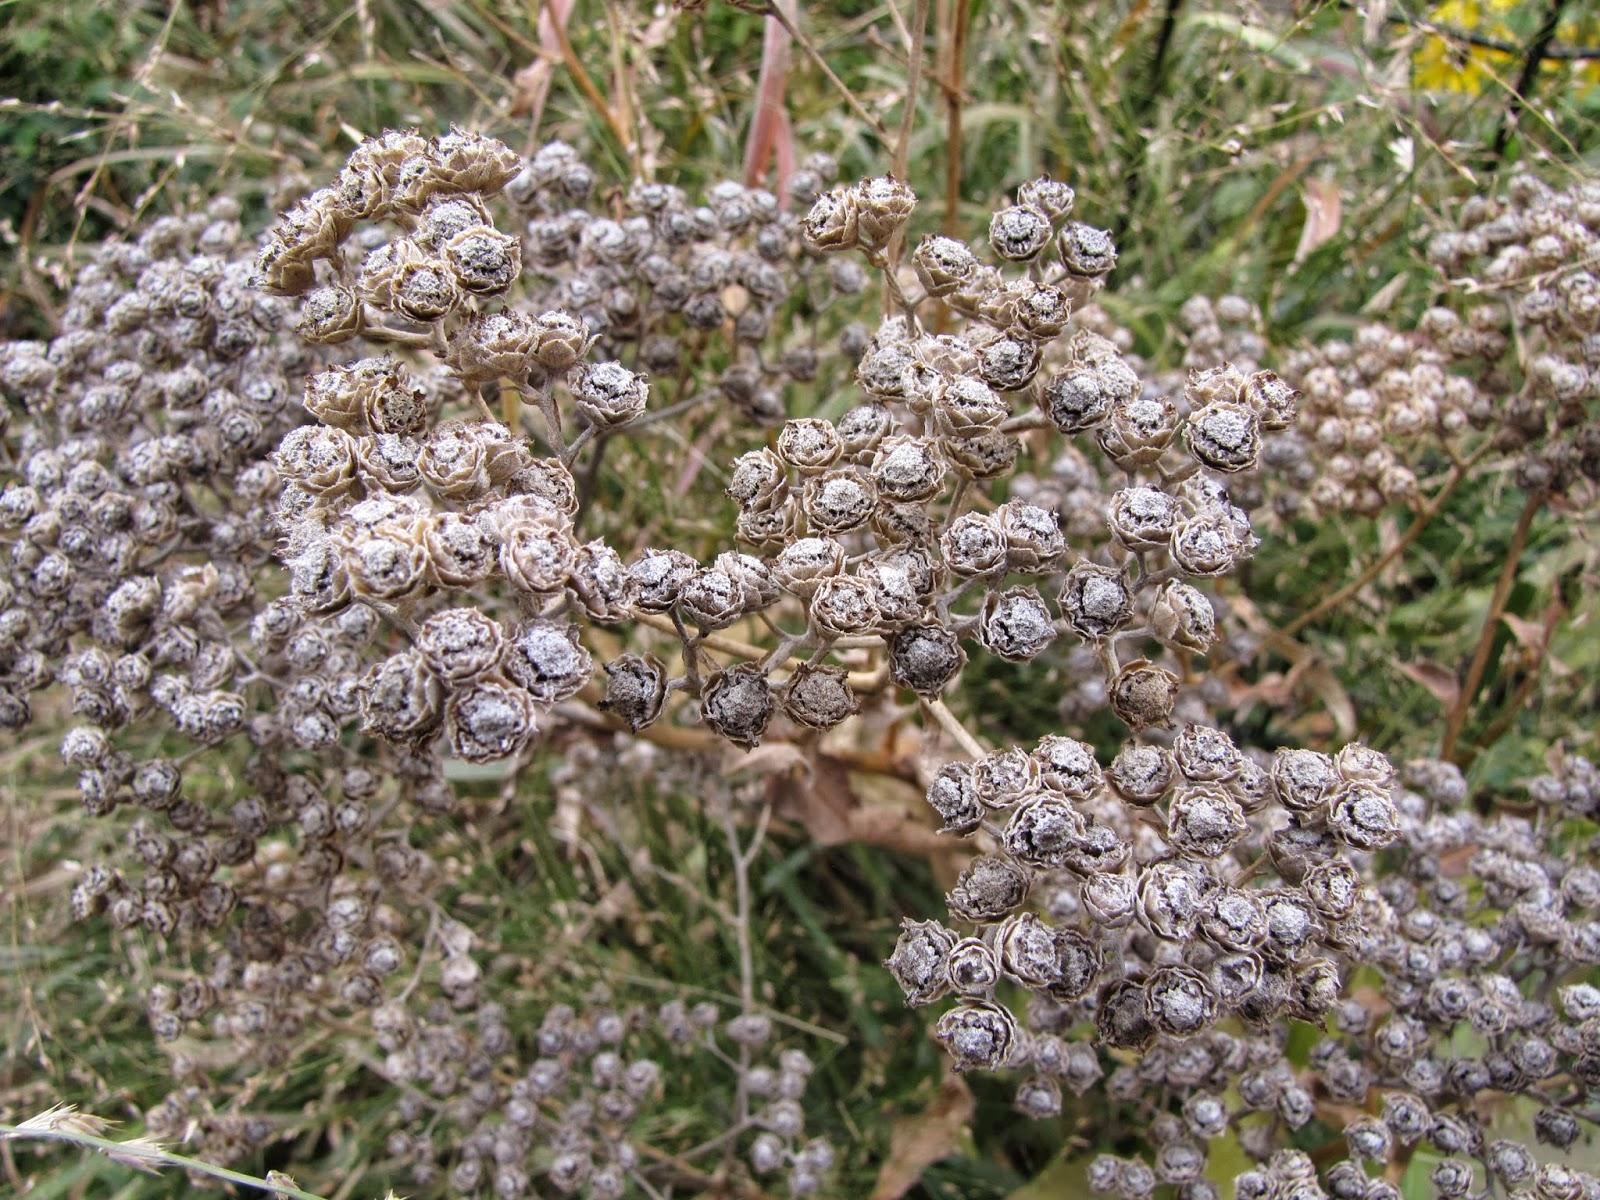 A Corner Garden: Taking Liberties with Wildflower Wednesday